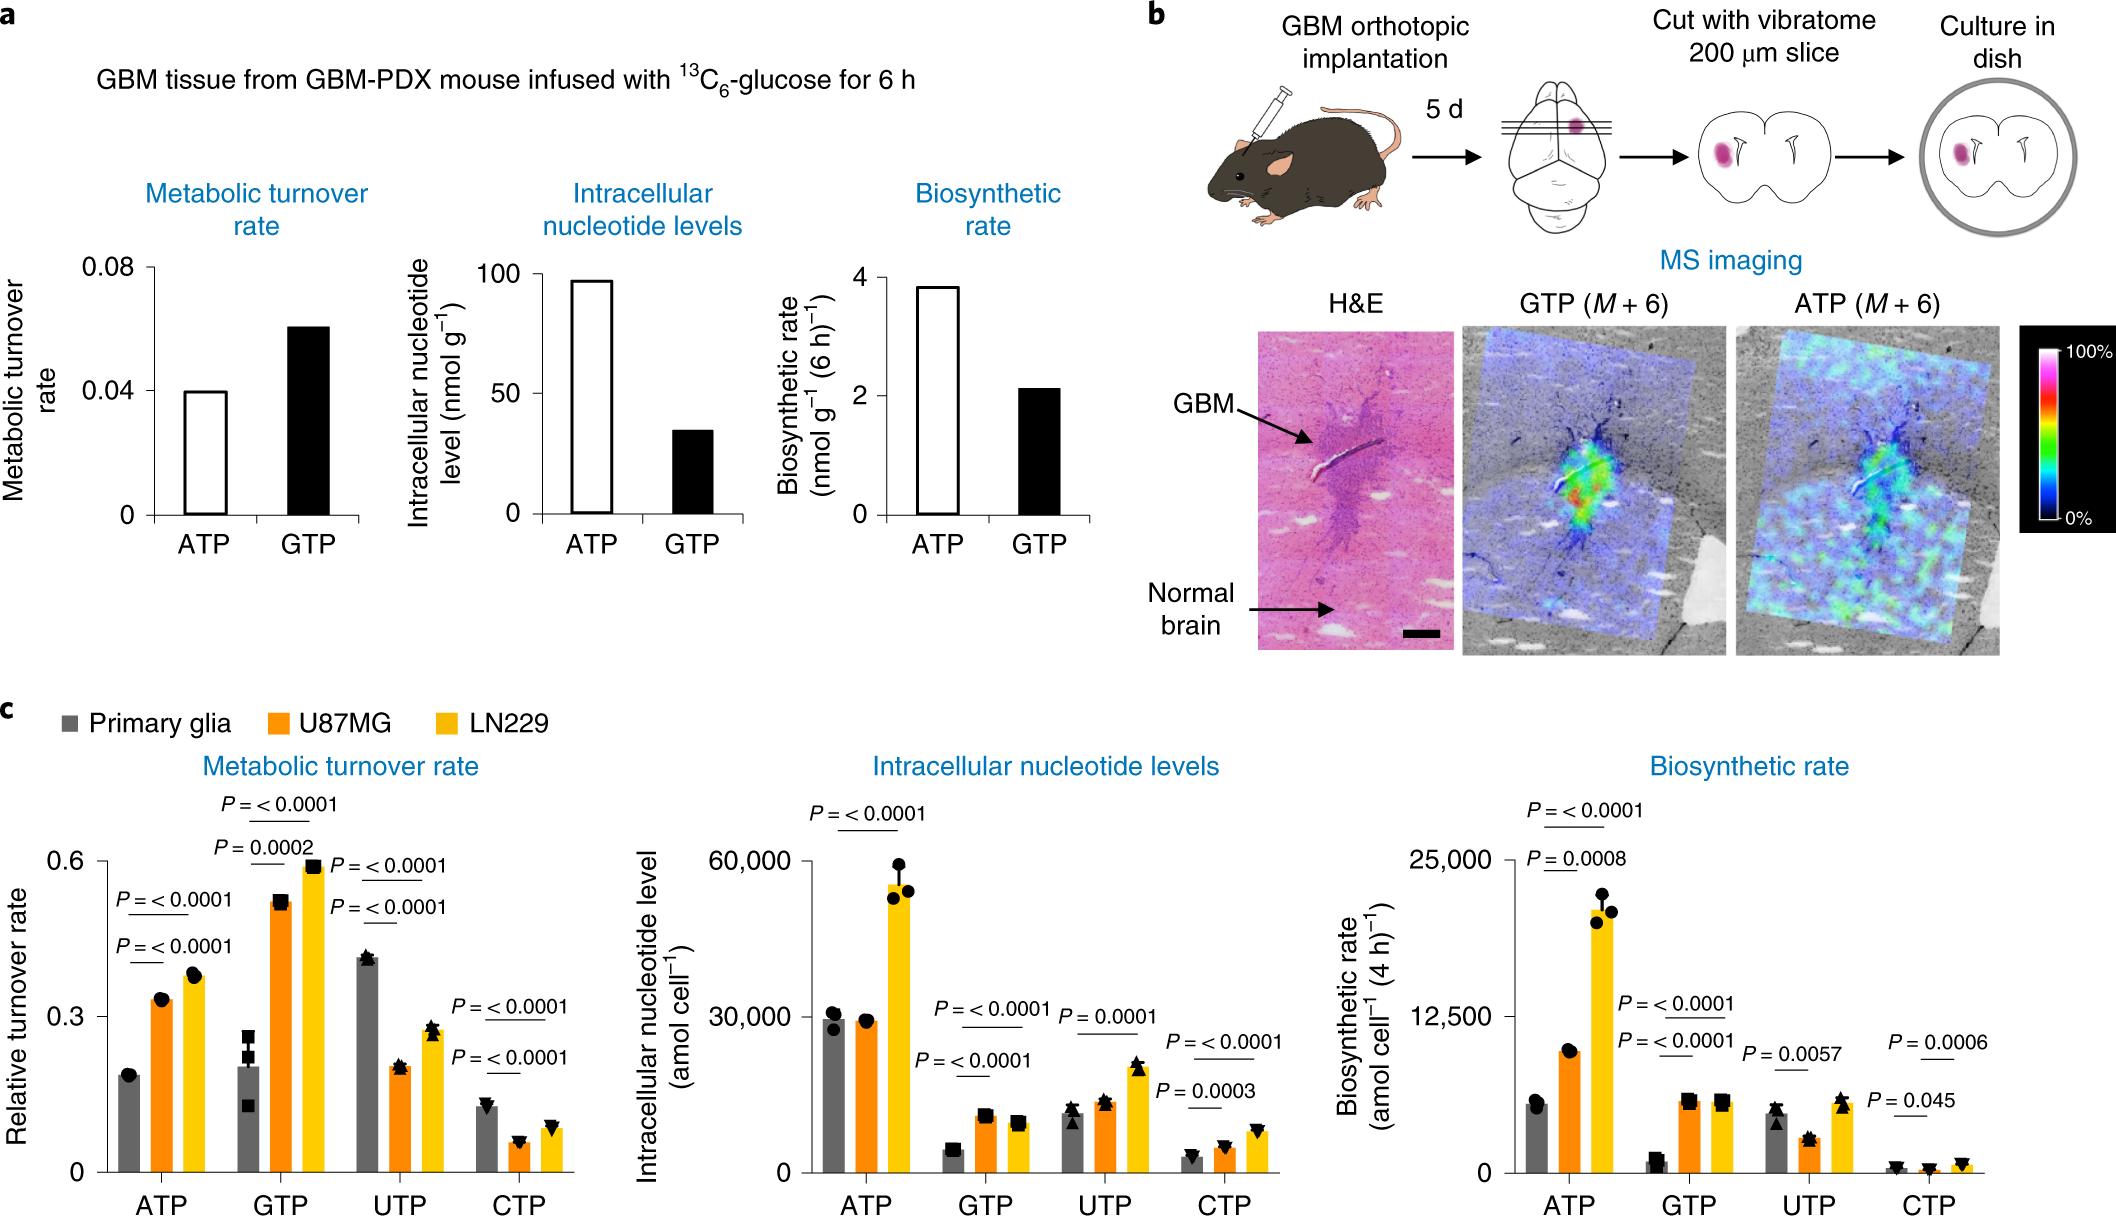 IMP dehydrogenase-2 drives aberrant nucleolar activity and promotes